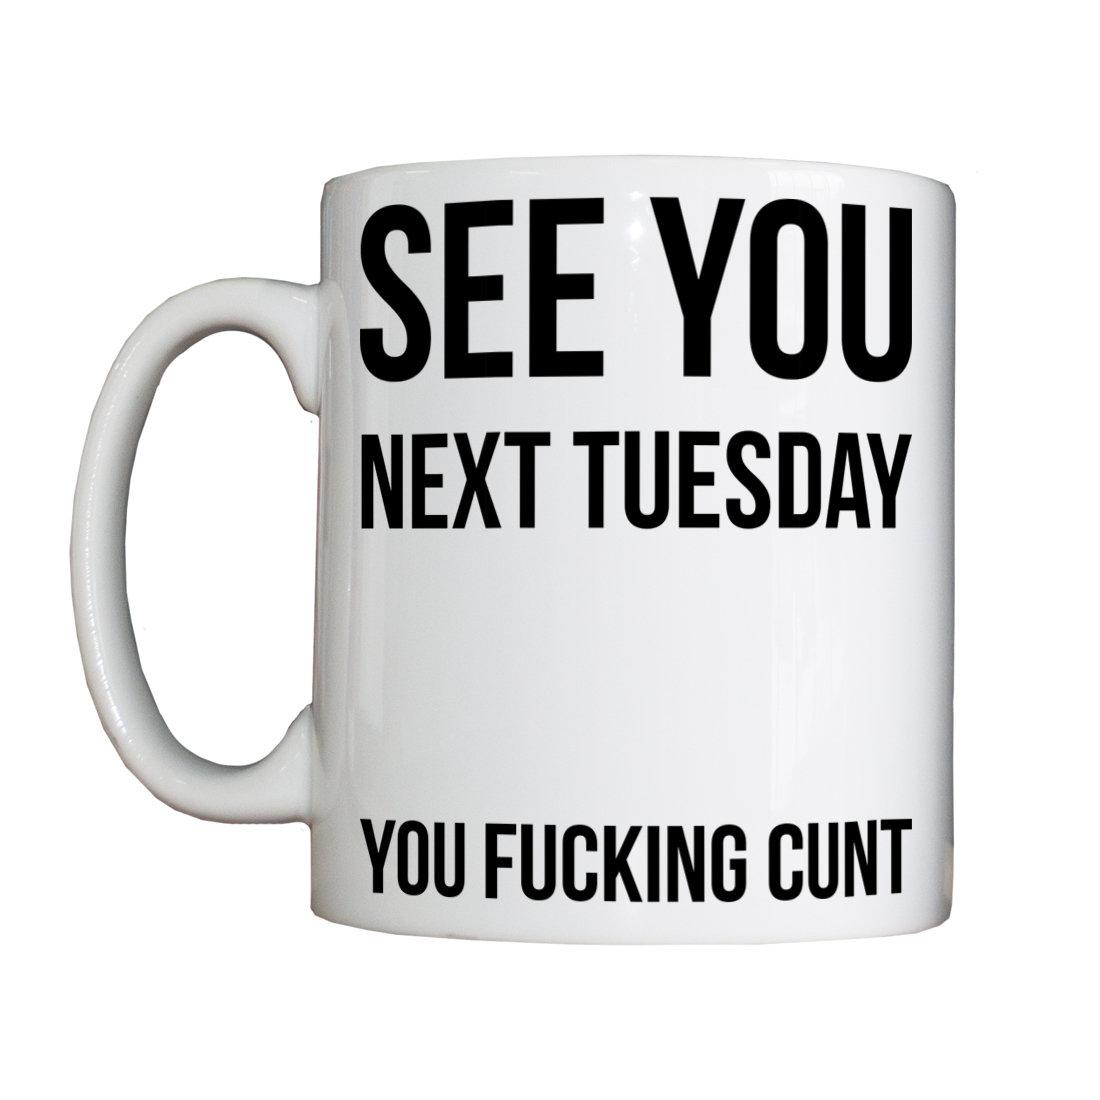 See You Next Tuesday Mug CUNTMug